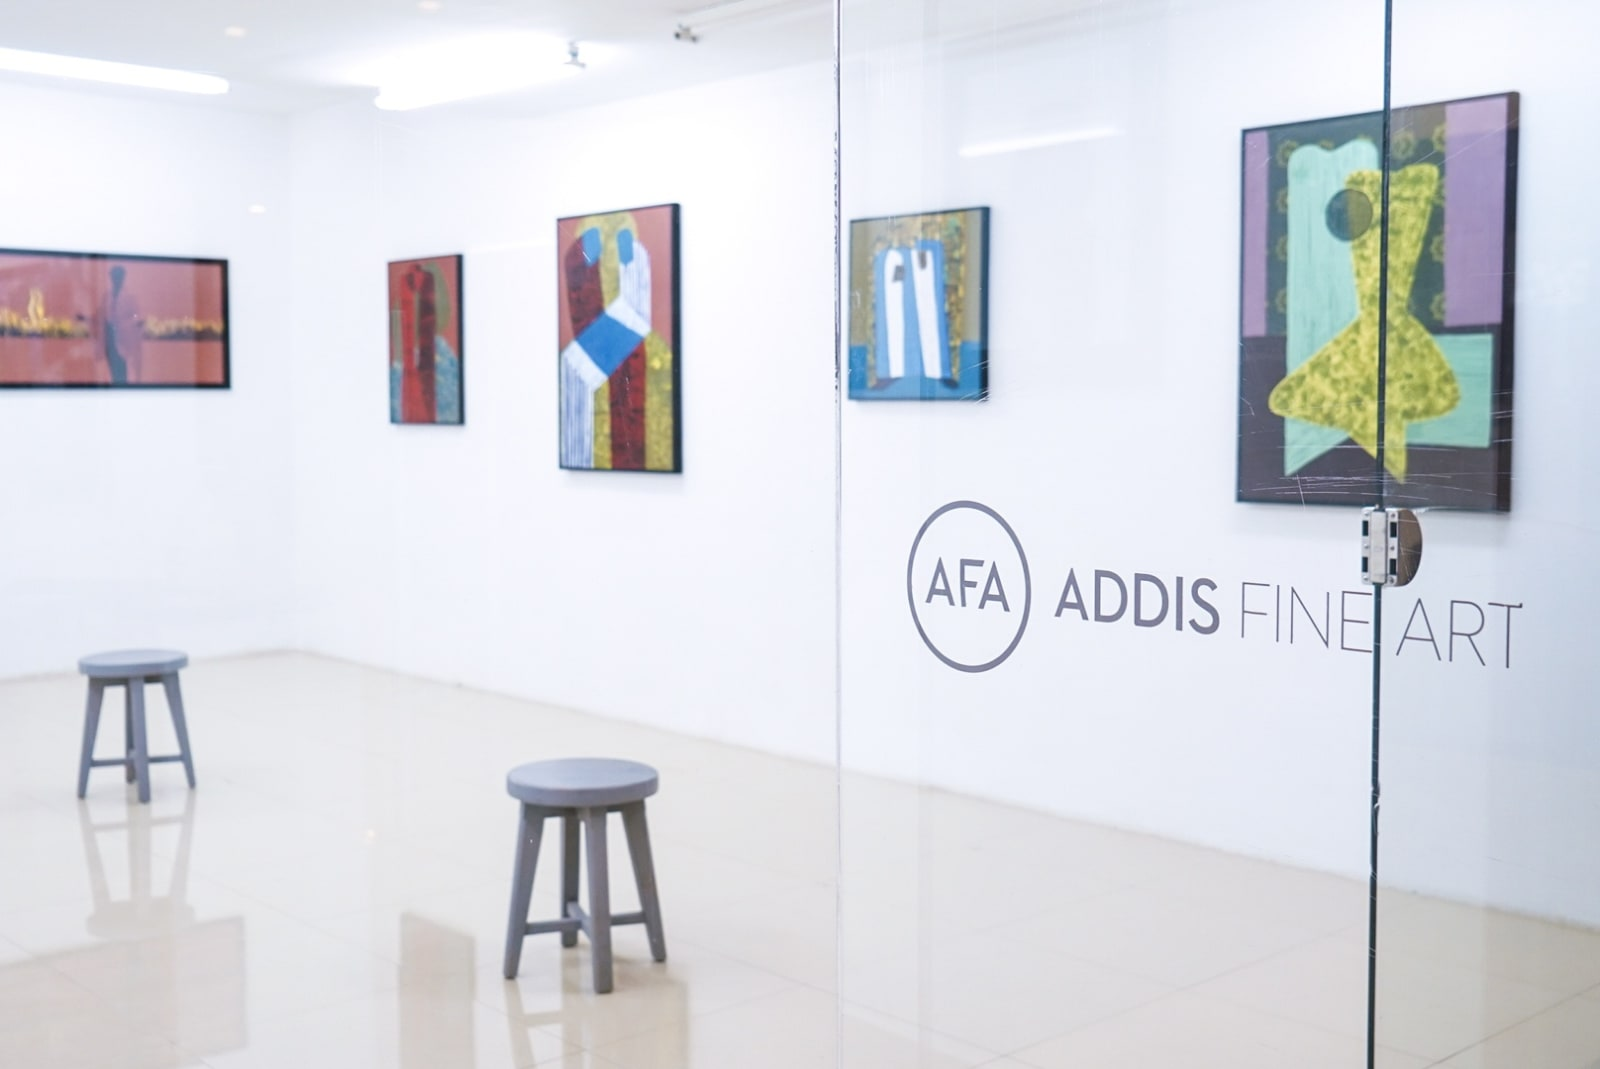 Installation view of Addis Calling IV, 2021. Courtesy of Addis Fine Art.